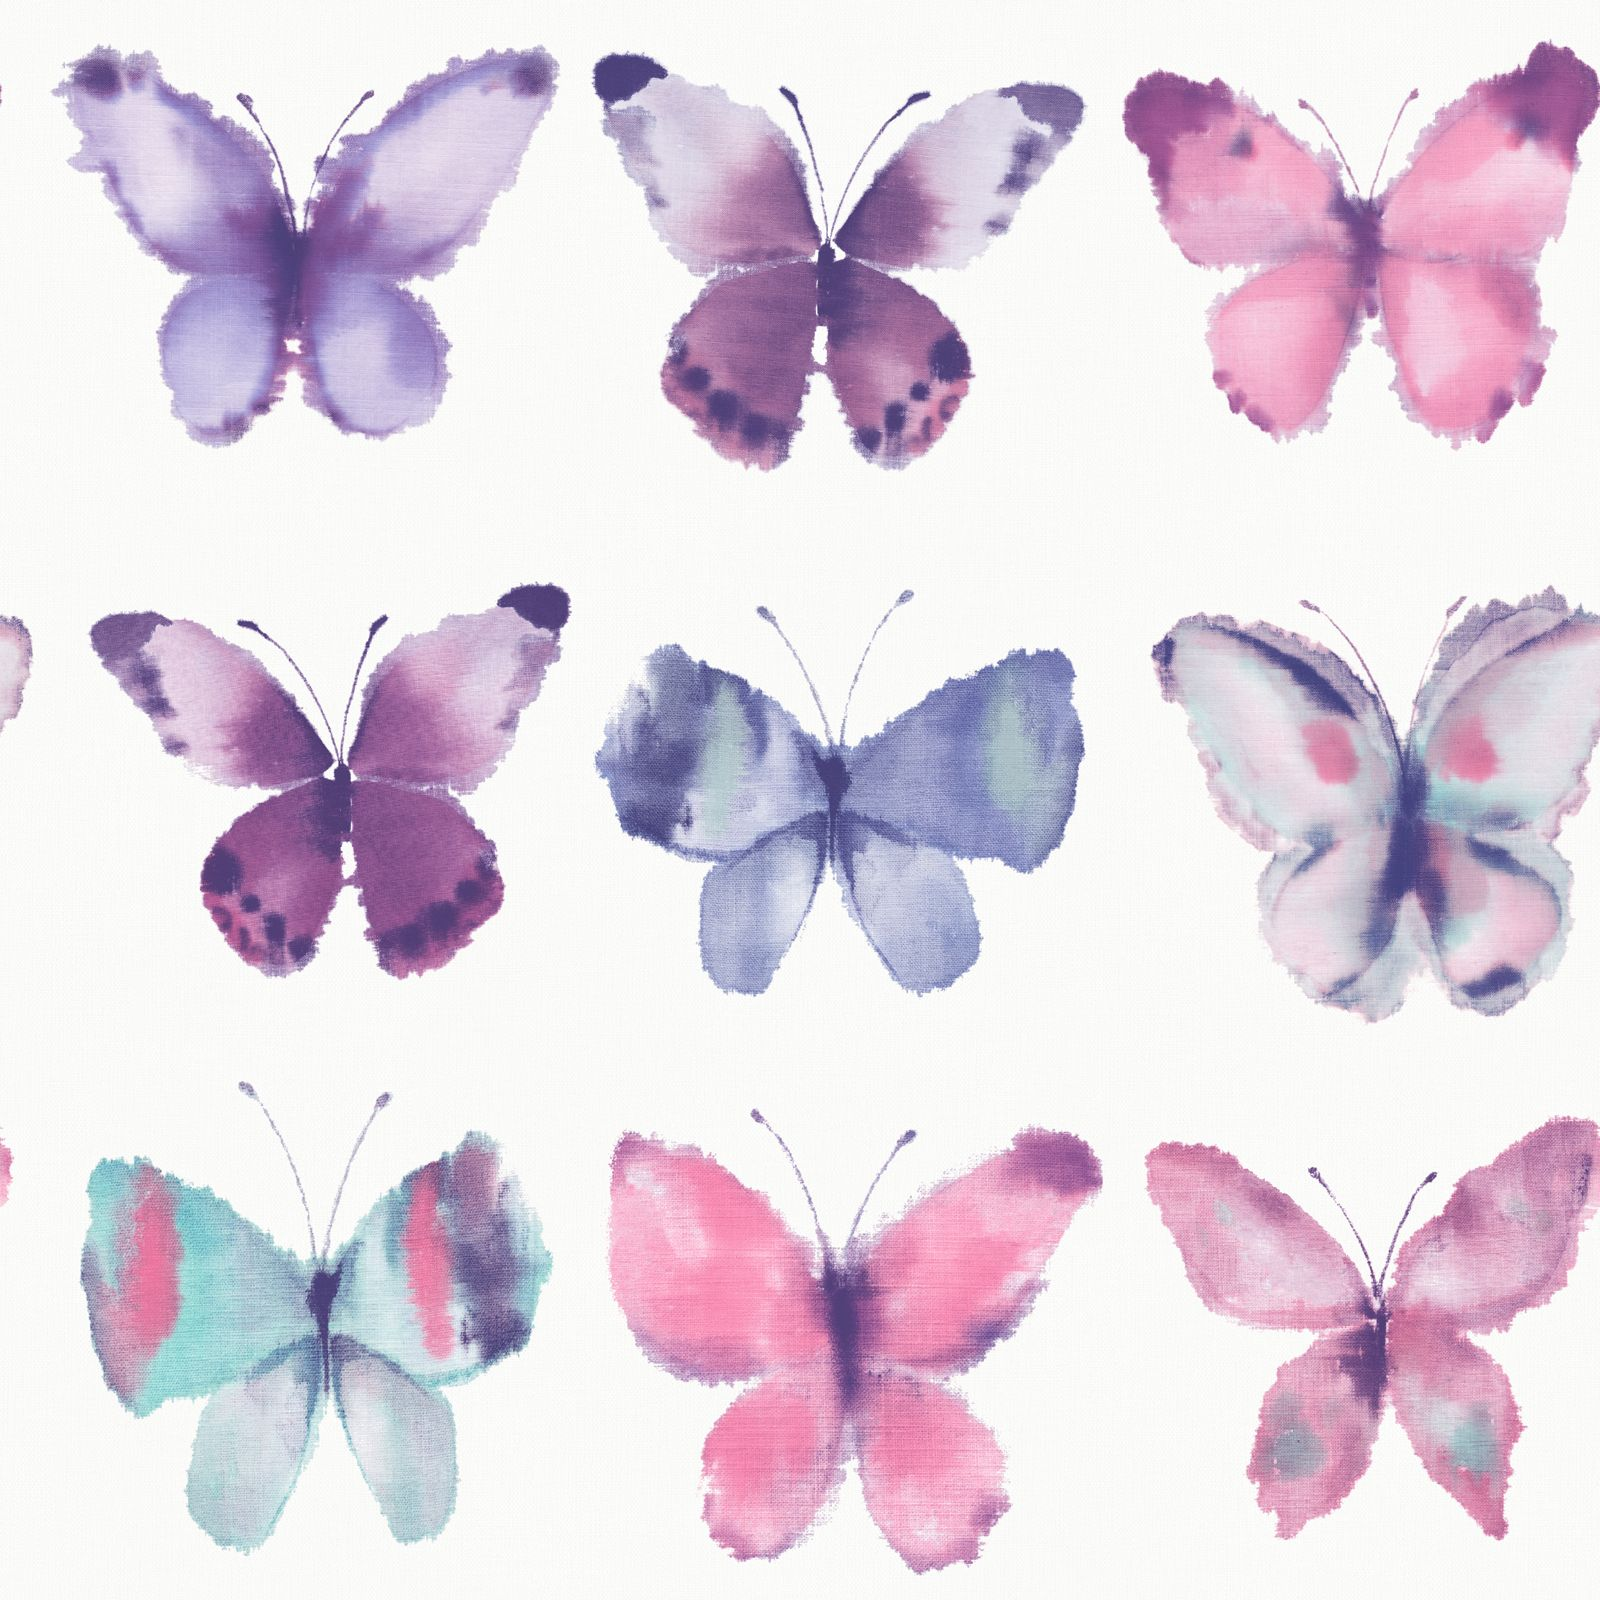 Butterfly-wallpaper 22382 - Butterflies Pink And Purple , HD Wallpaper & Backgrounds